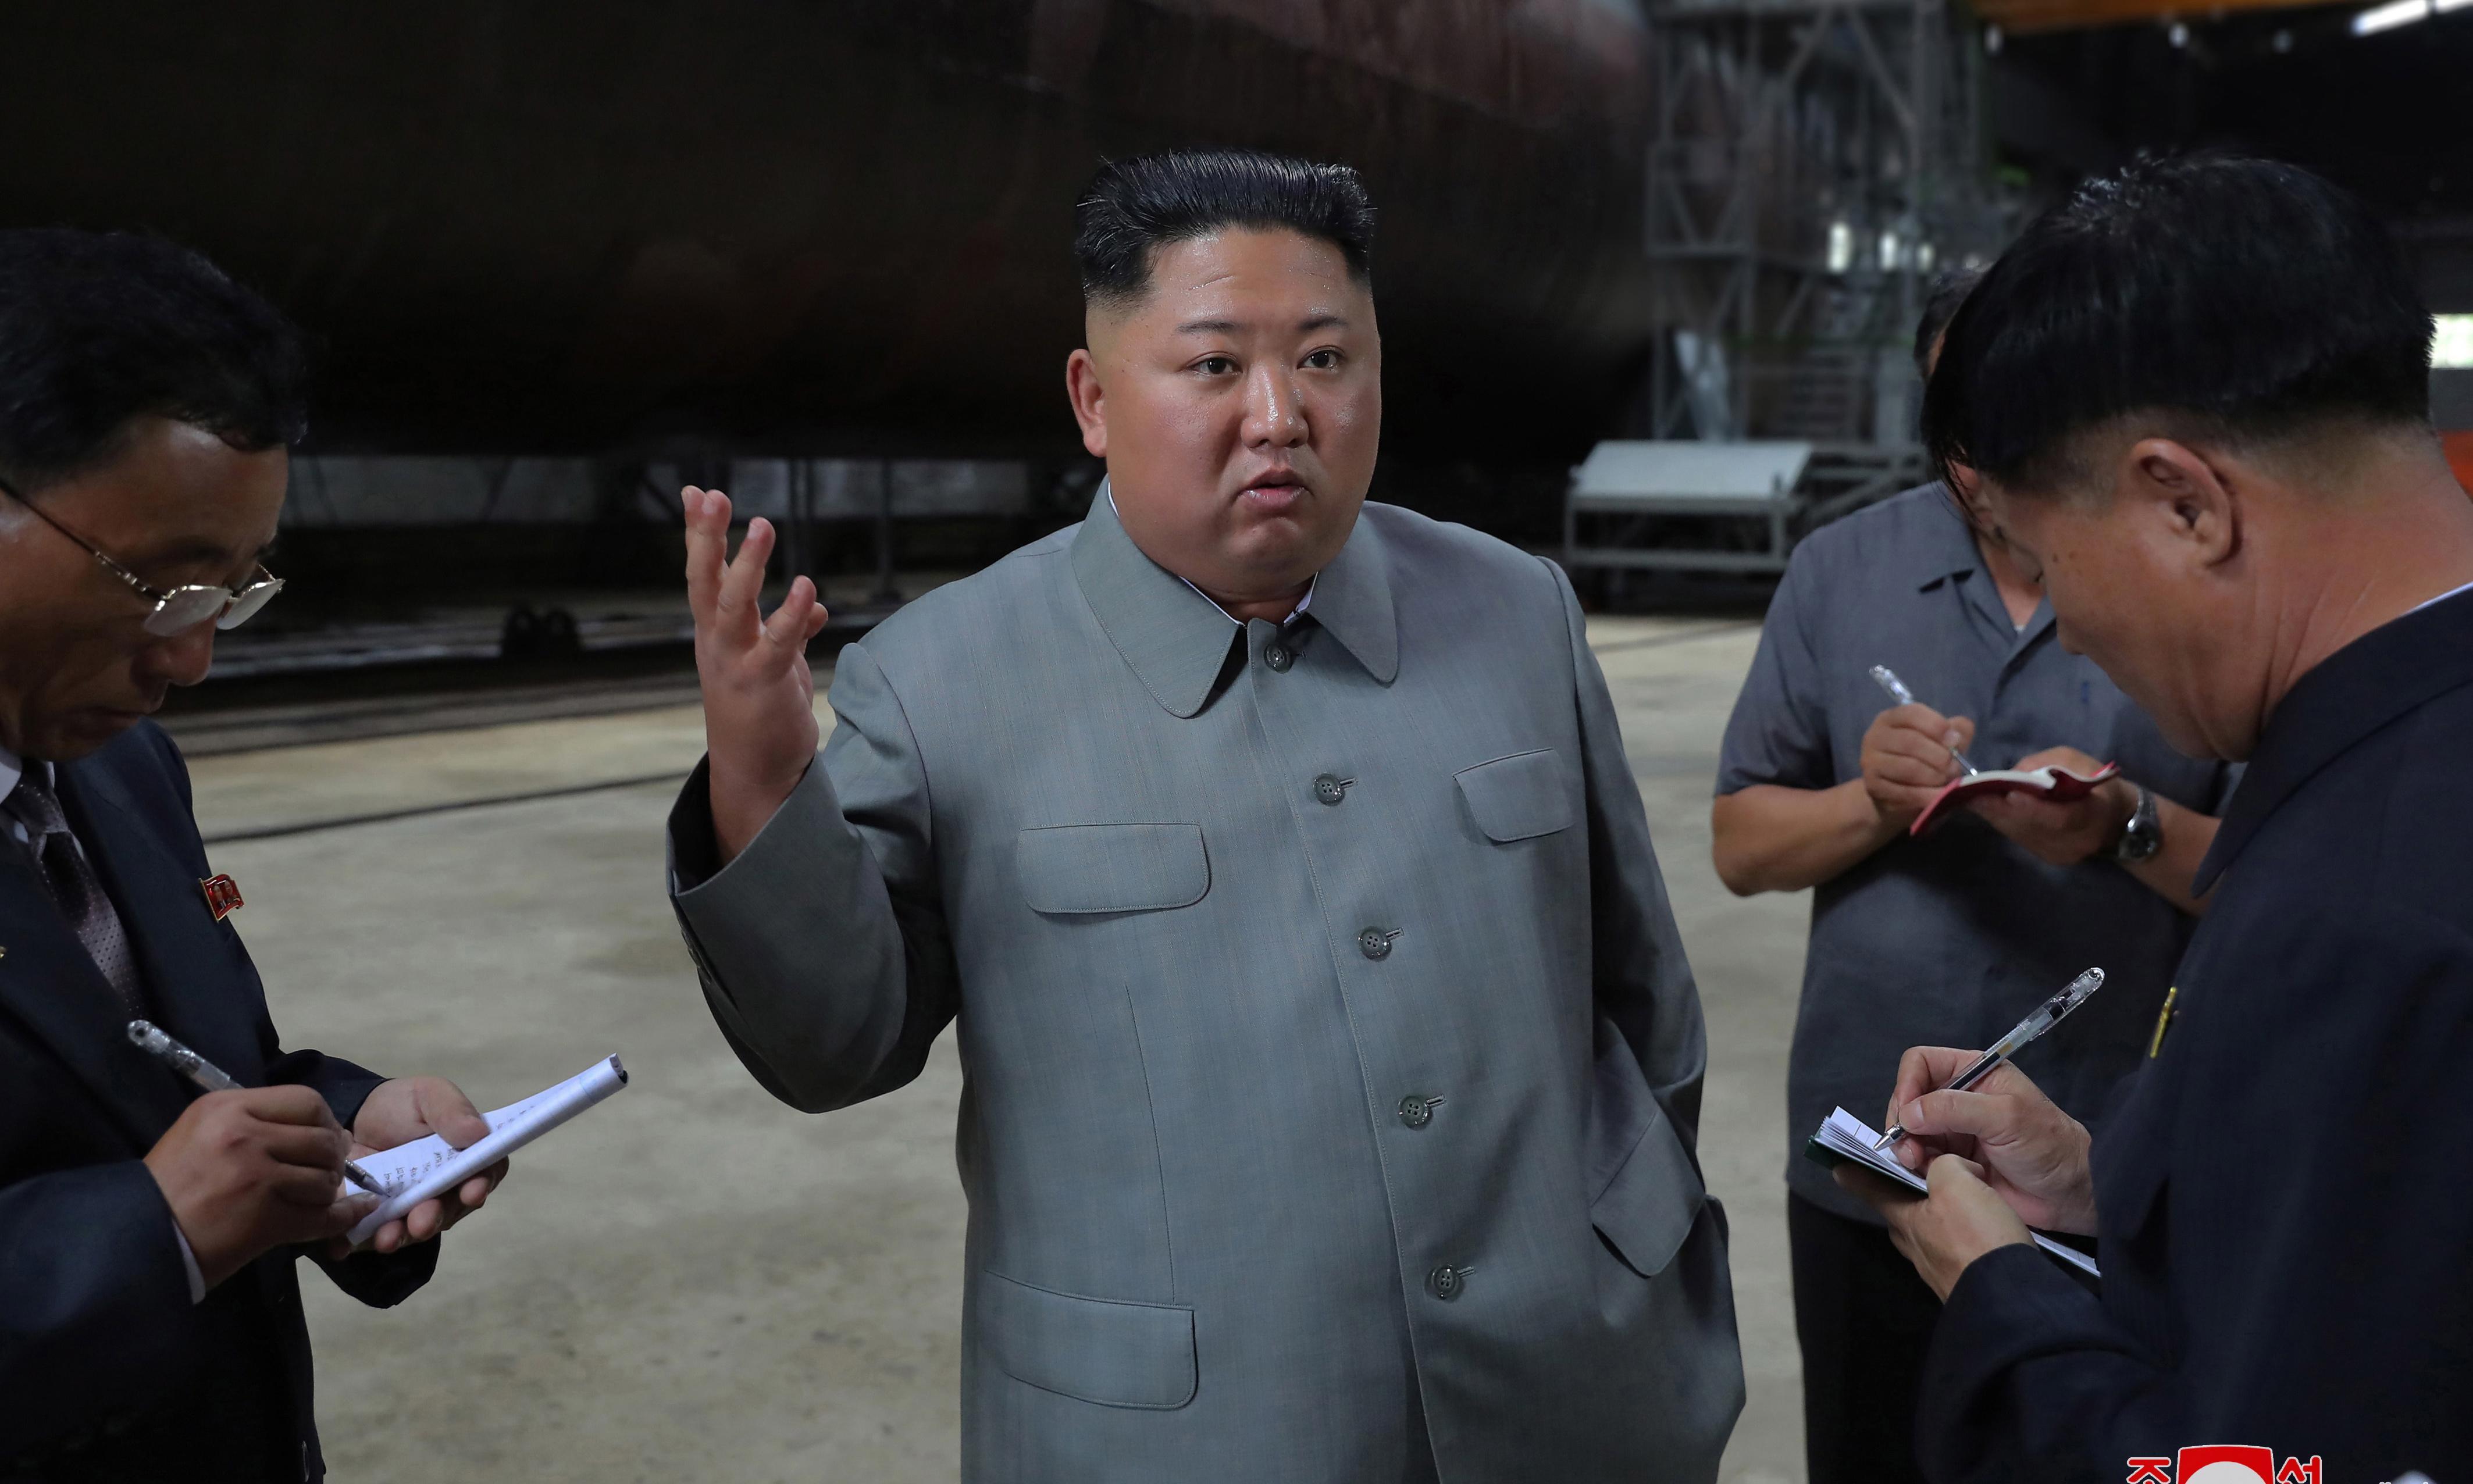 Kim Jong-un inspects new submarine, raising ballistic missile fears